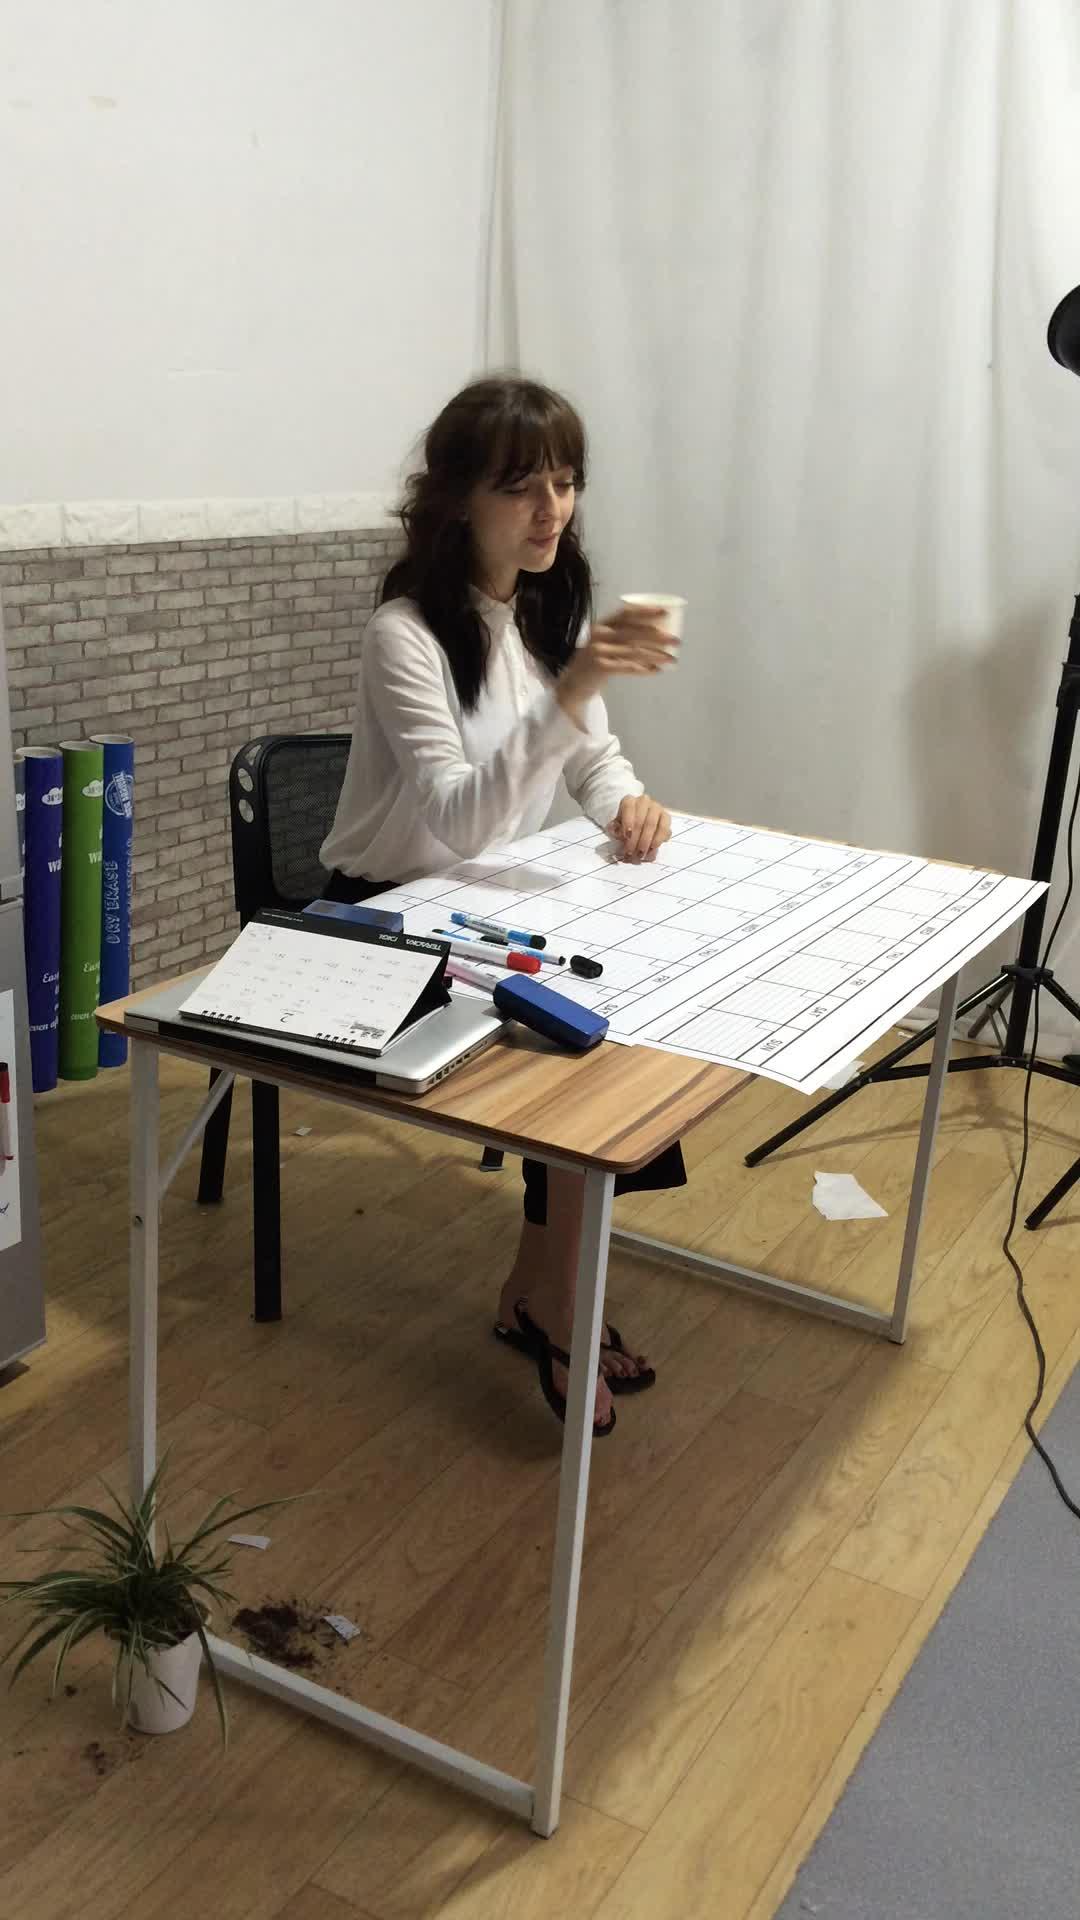 2018 Dry Erase Jumbo Wall Calendar Printing with Lamination